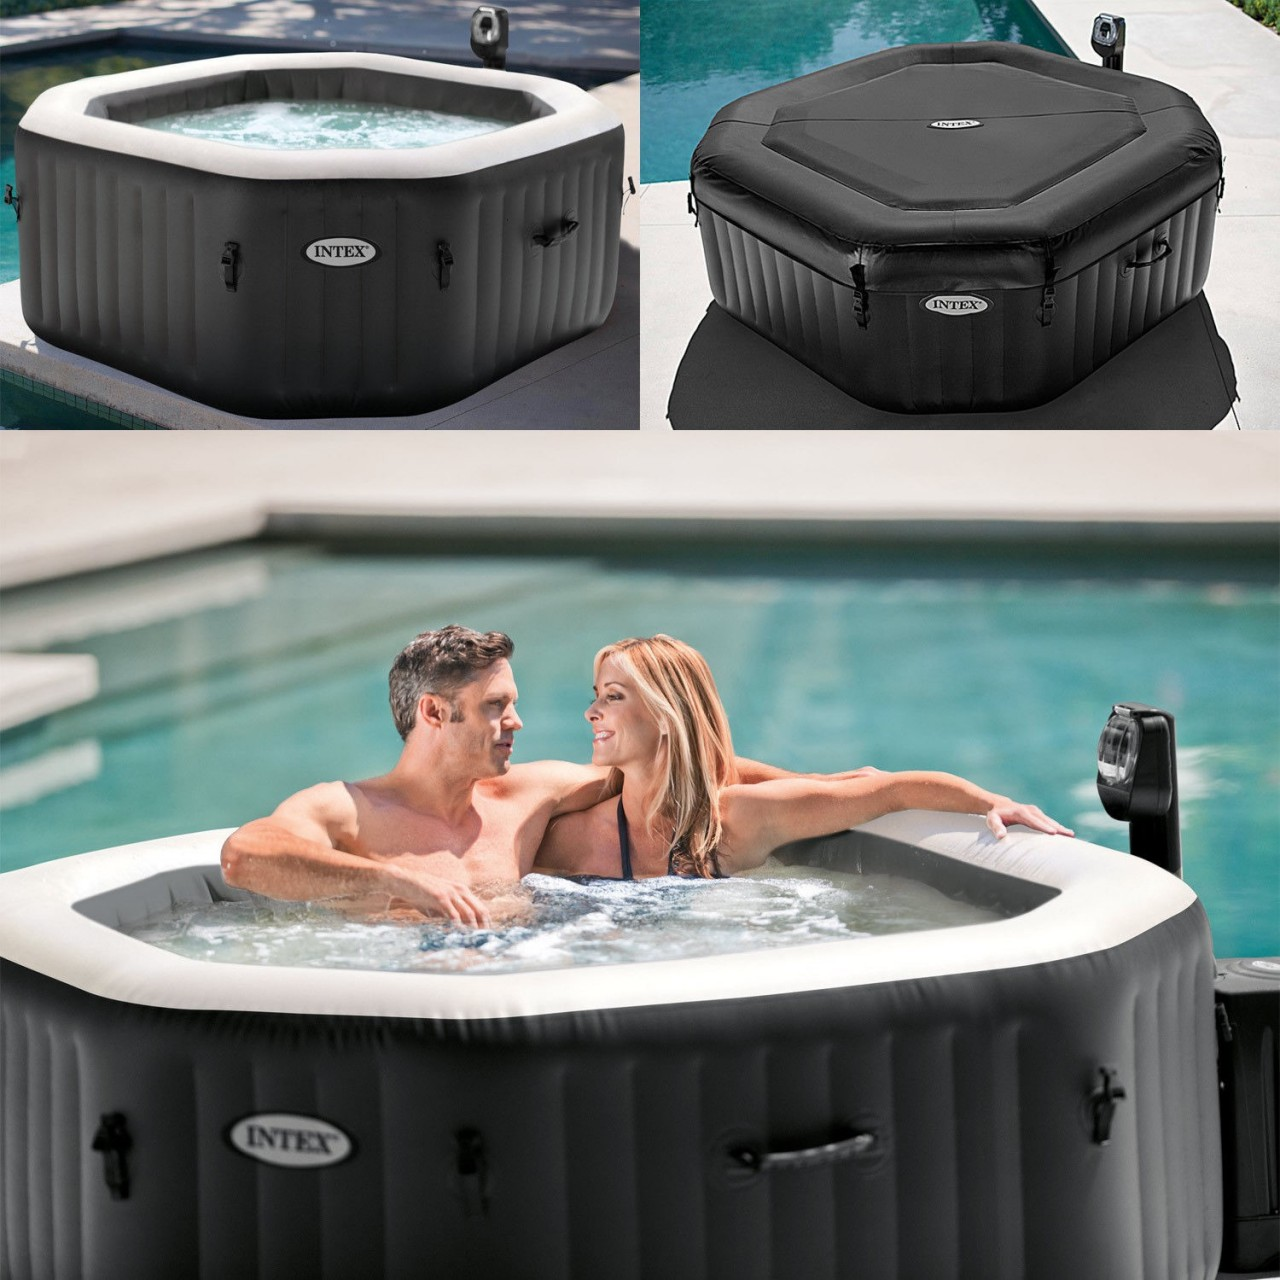 Intex 28454 Whirlpool Pure Spa Bubble Jet Salzwassersystem 201x71cm 4 Personen